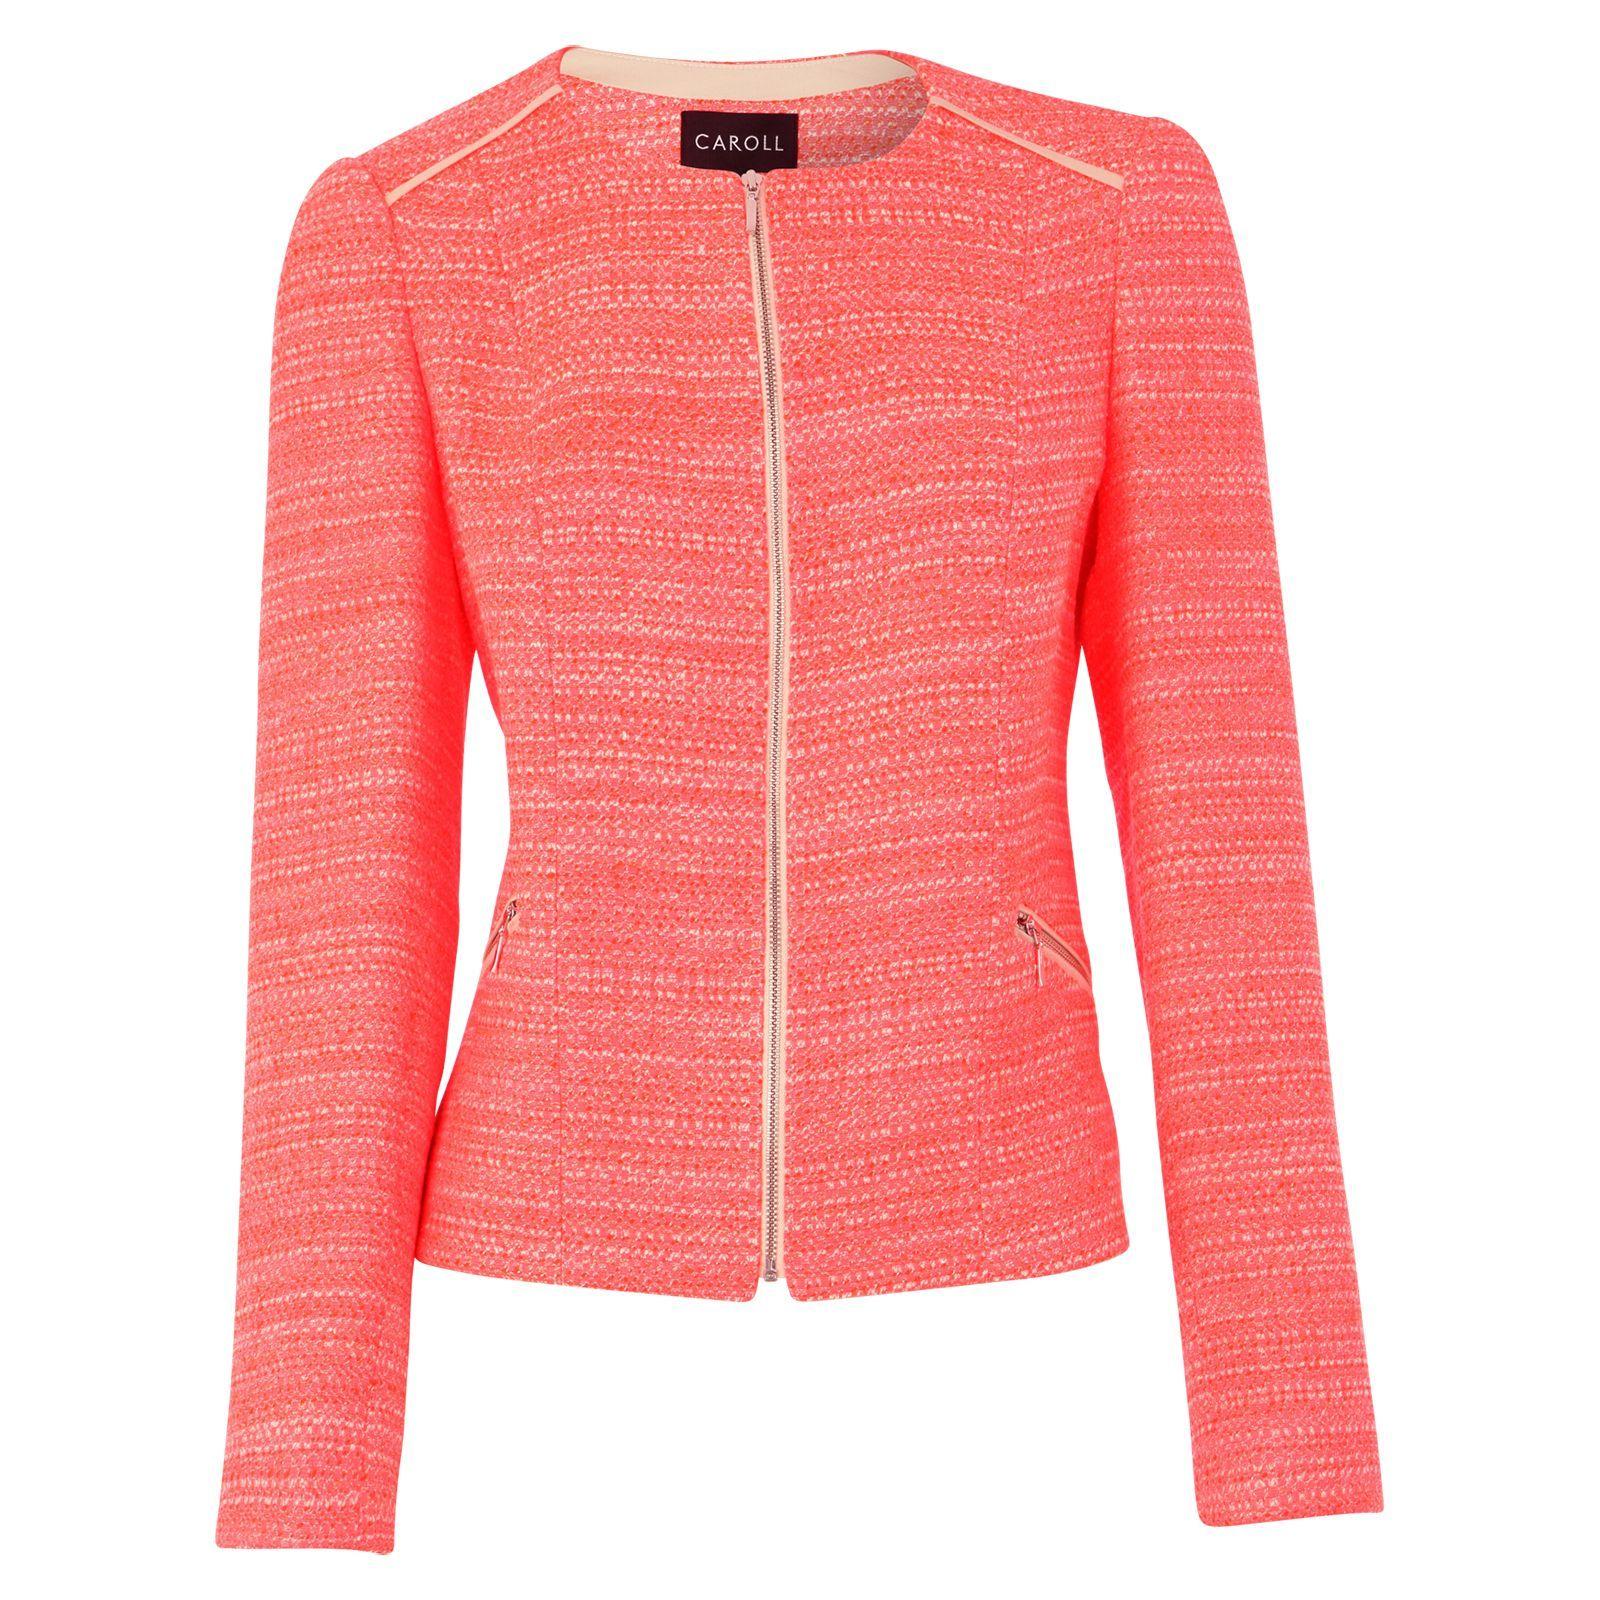 Veste Ella mandarine - Caroll   Brandalley   fashion   style ... b051d6fdab4